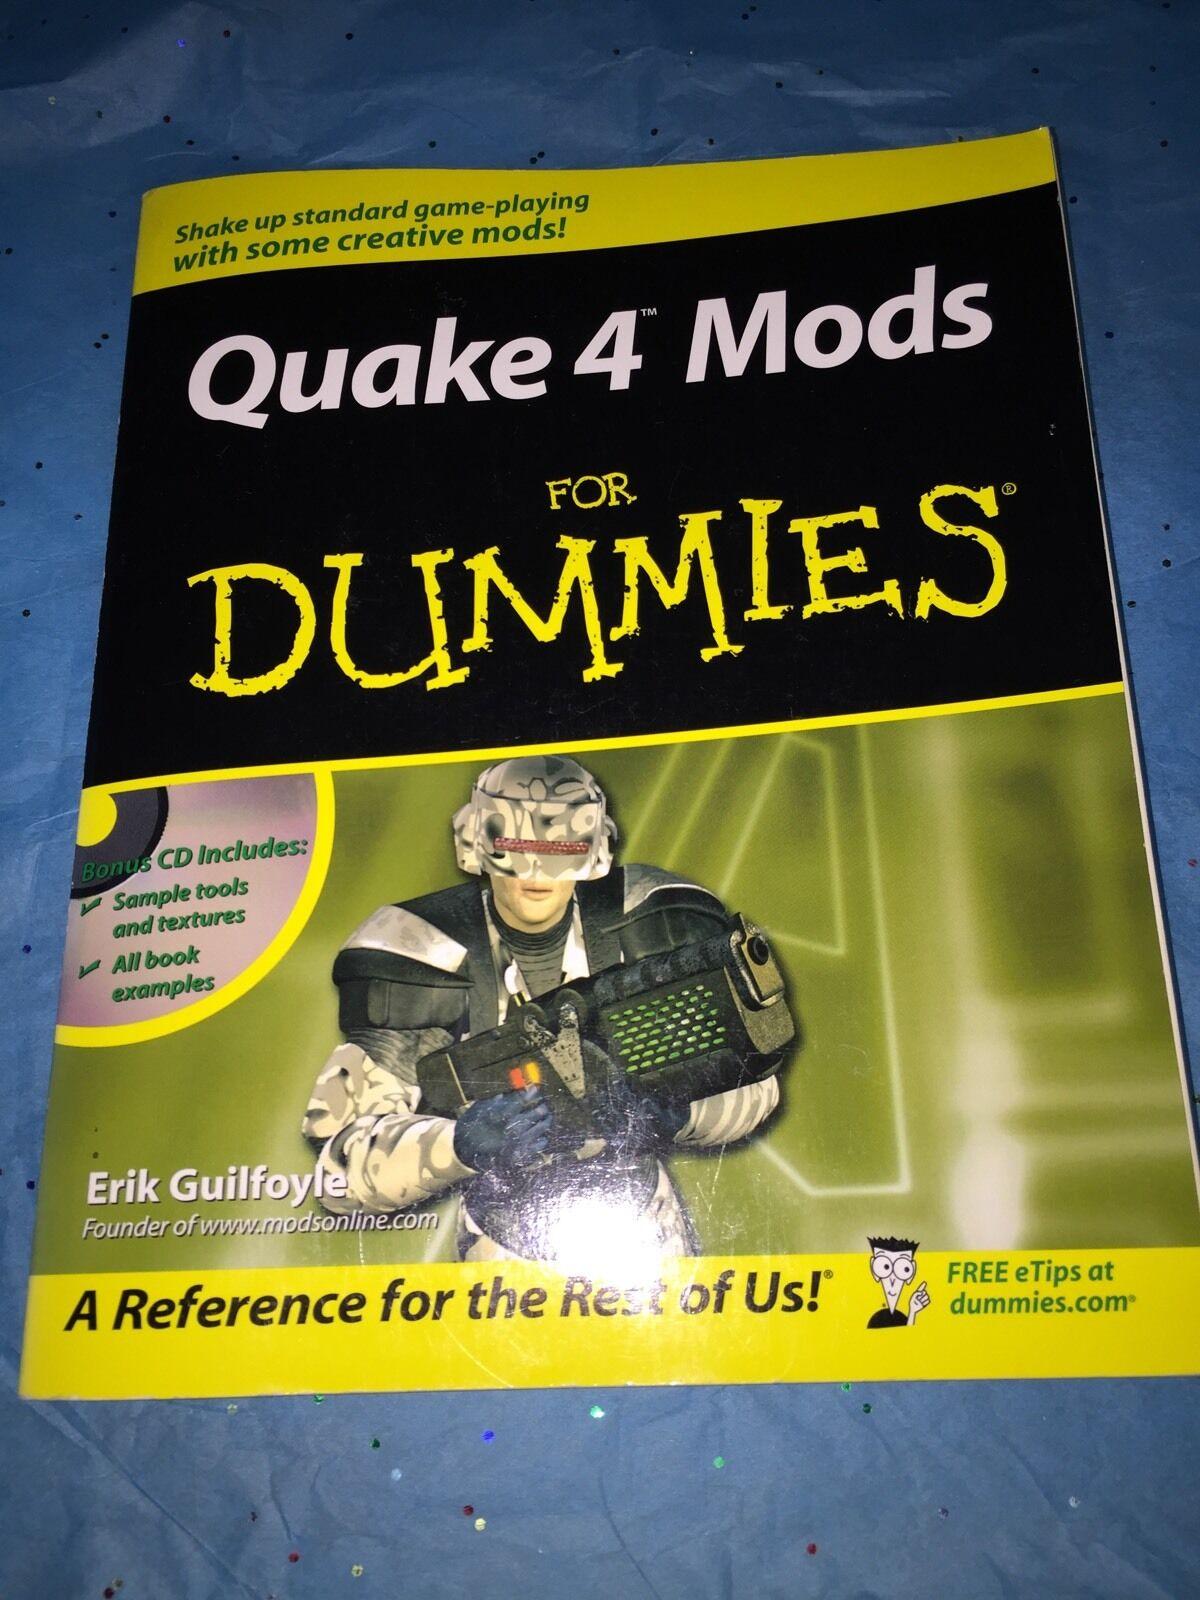 Quake 4 Mods for Dummies by Erik Guilfoyle (2006, Paperback)